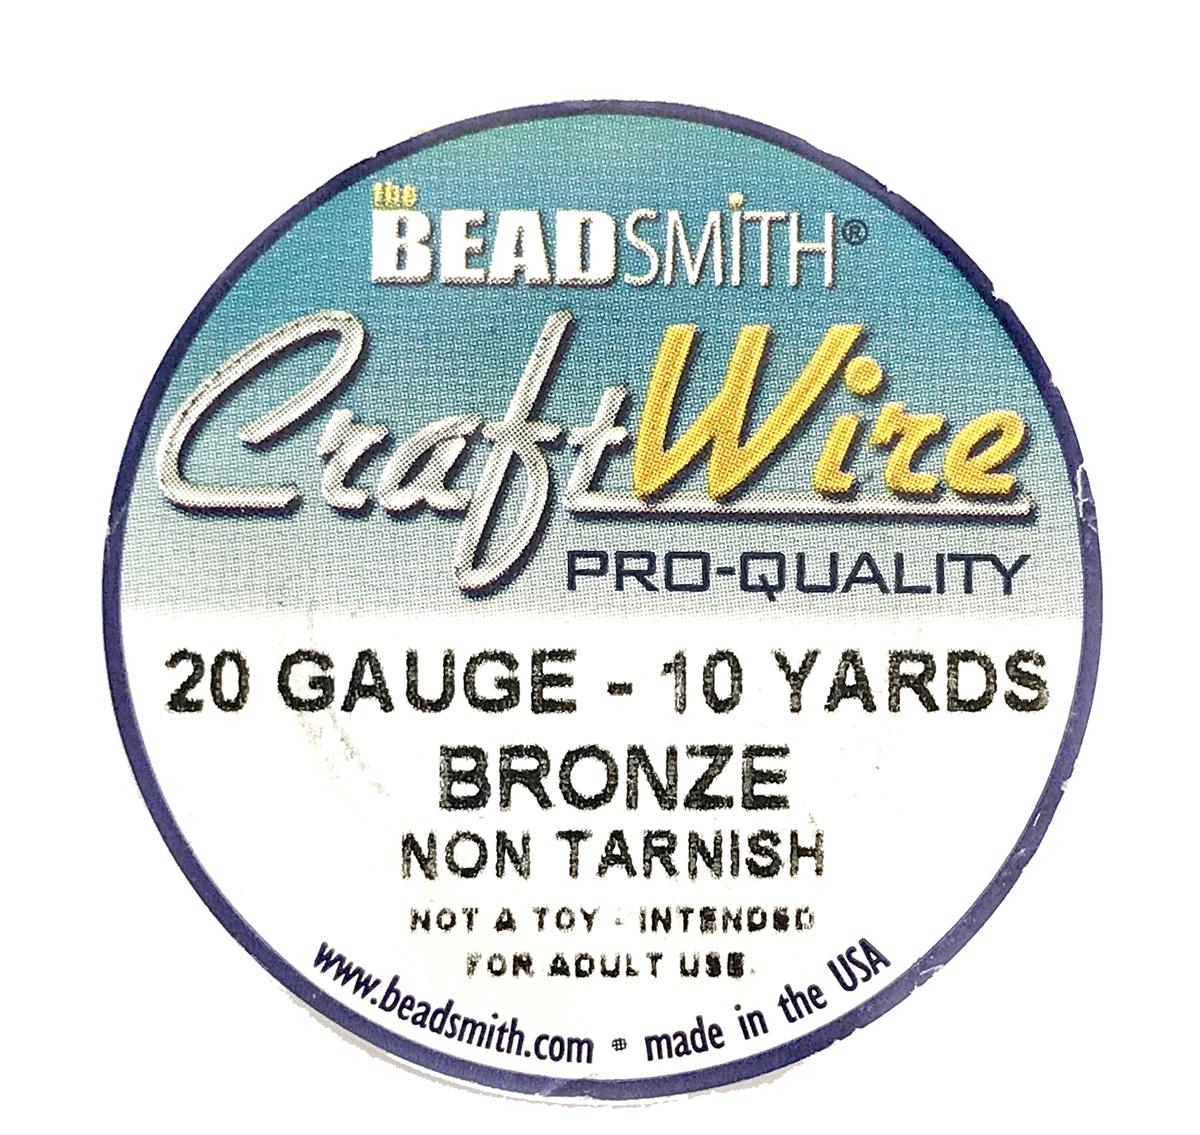 bronze wire, jewelry wire, bead smith, 20 gauge, bronze, wire, craft ...